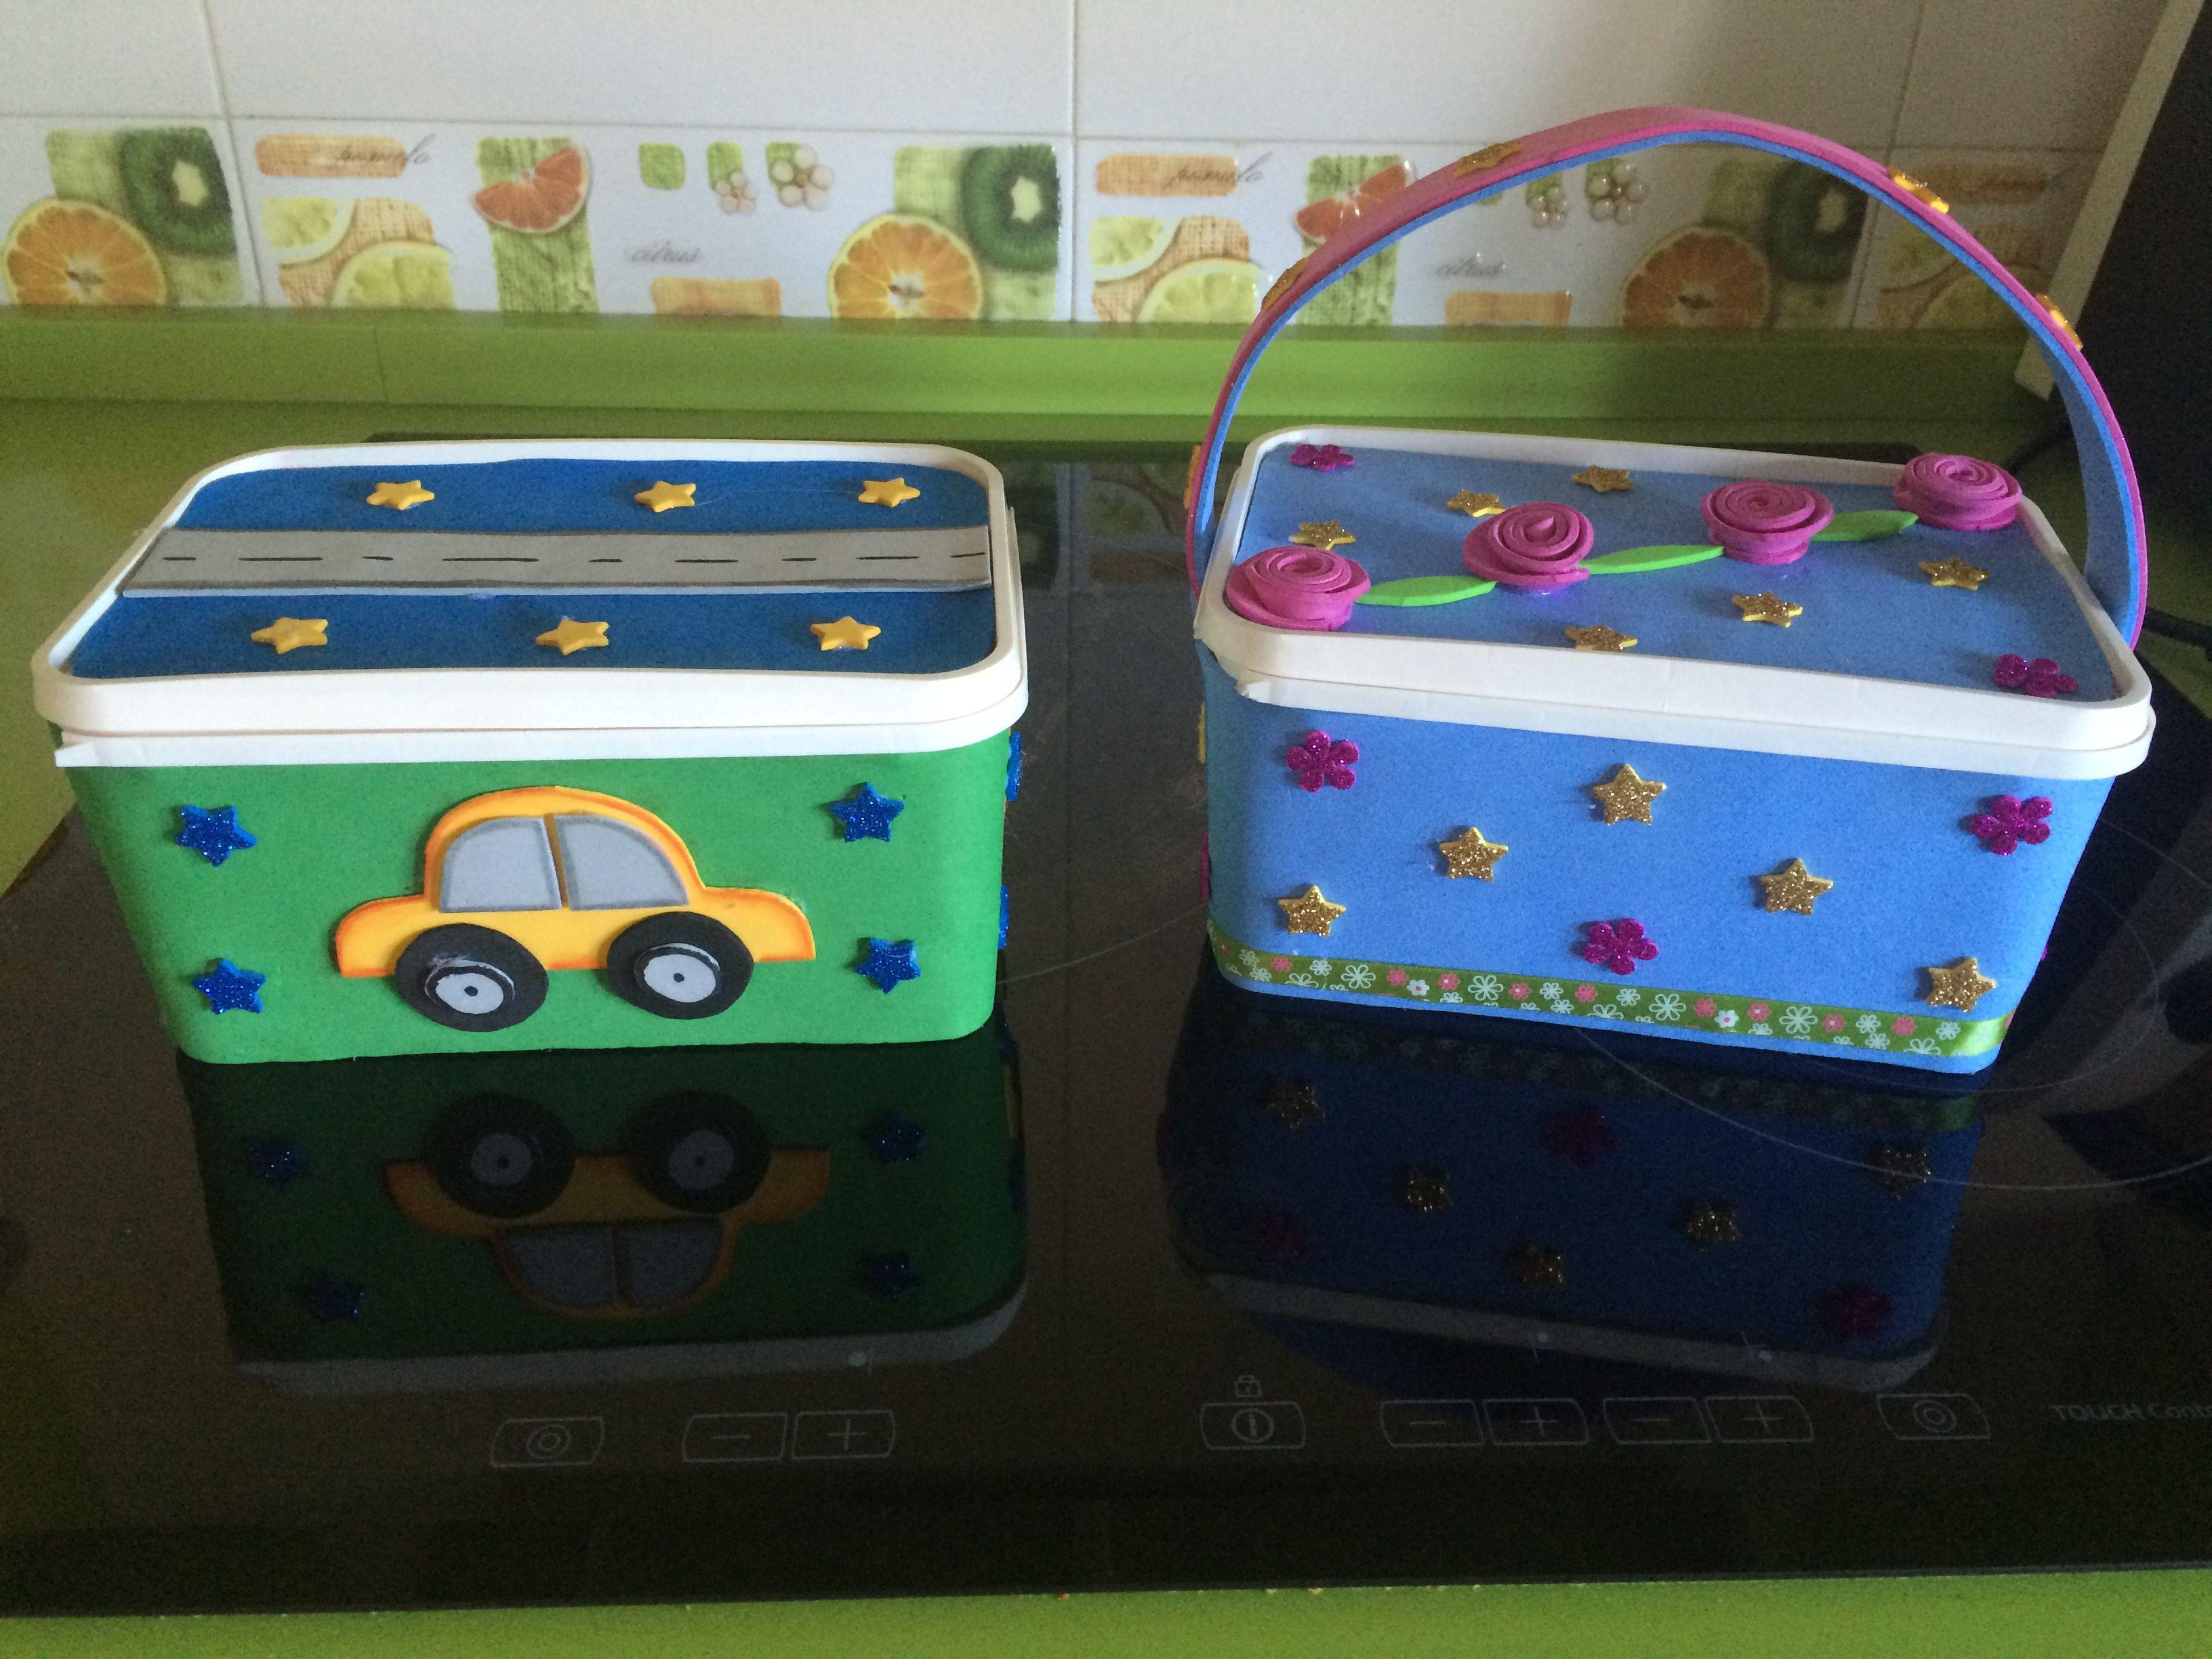 cajas decoradas ideales para guardar juguetes pequeos o utensilios de pintura costura etc decorative boxesgoma evasewing